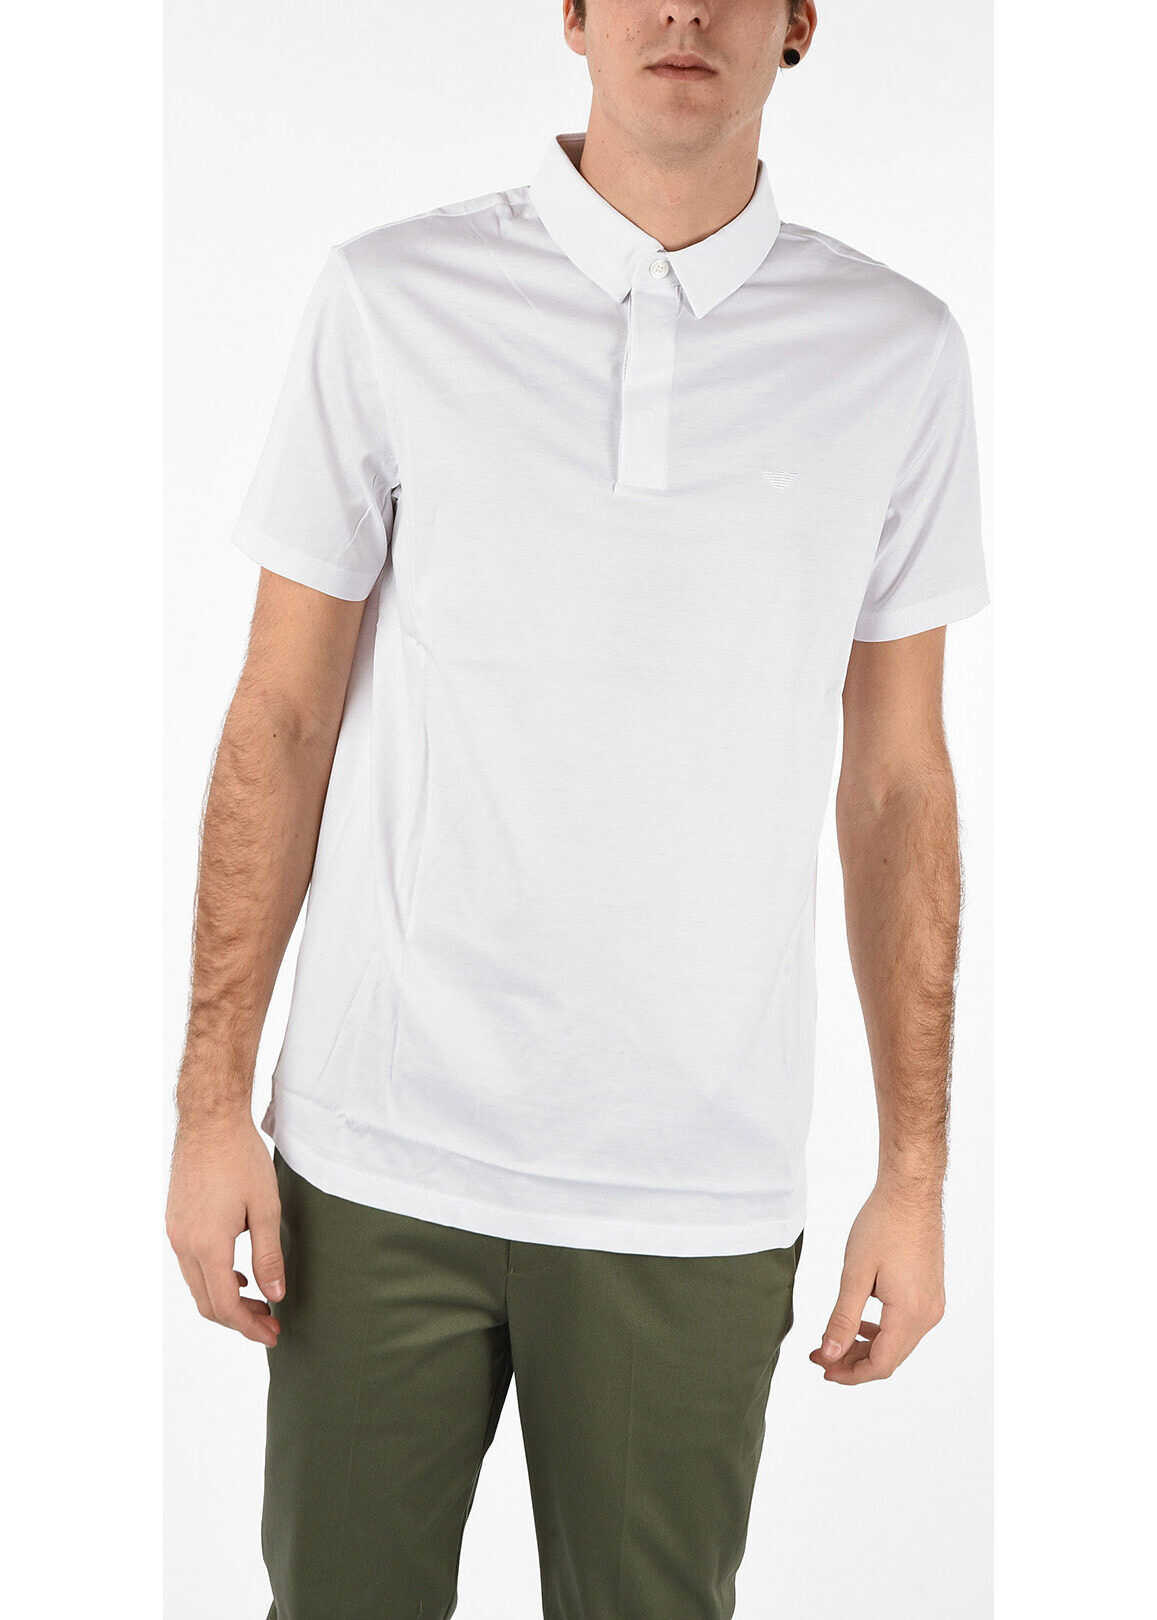 Armani EMPORIO Regular Fit Polo Shirt with Logo WHITE